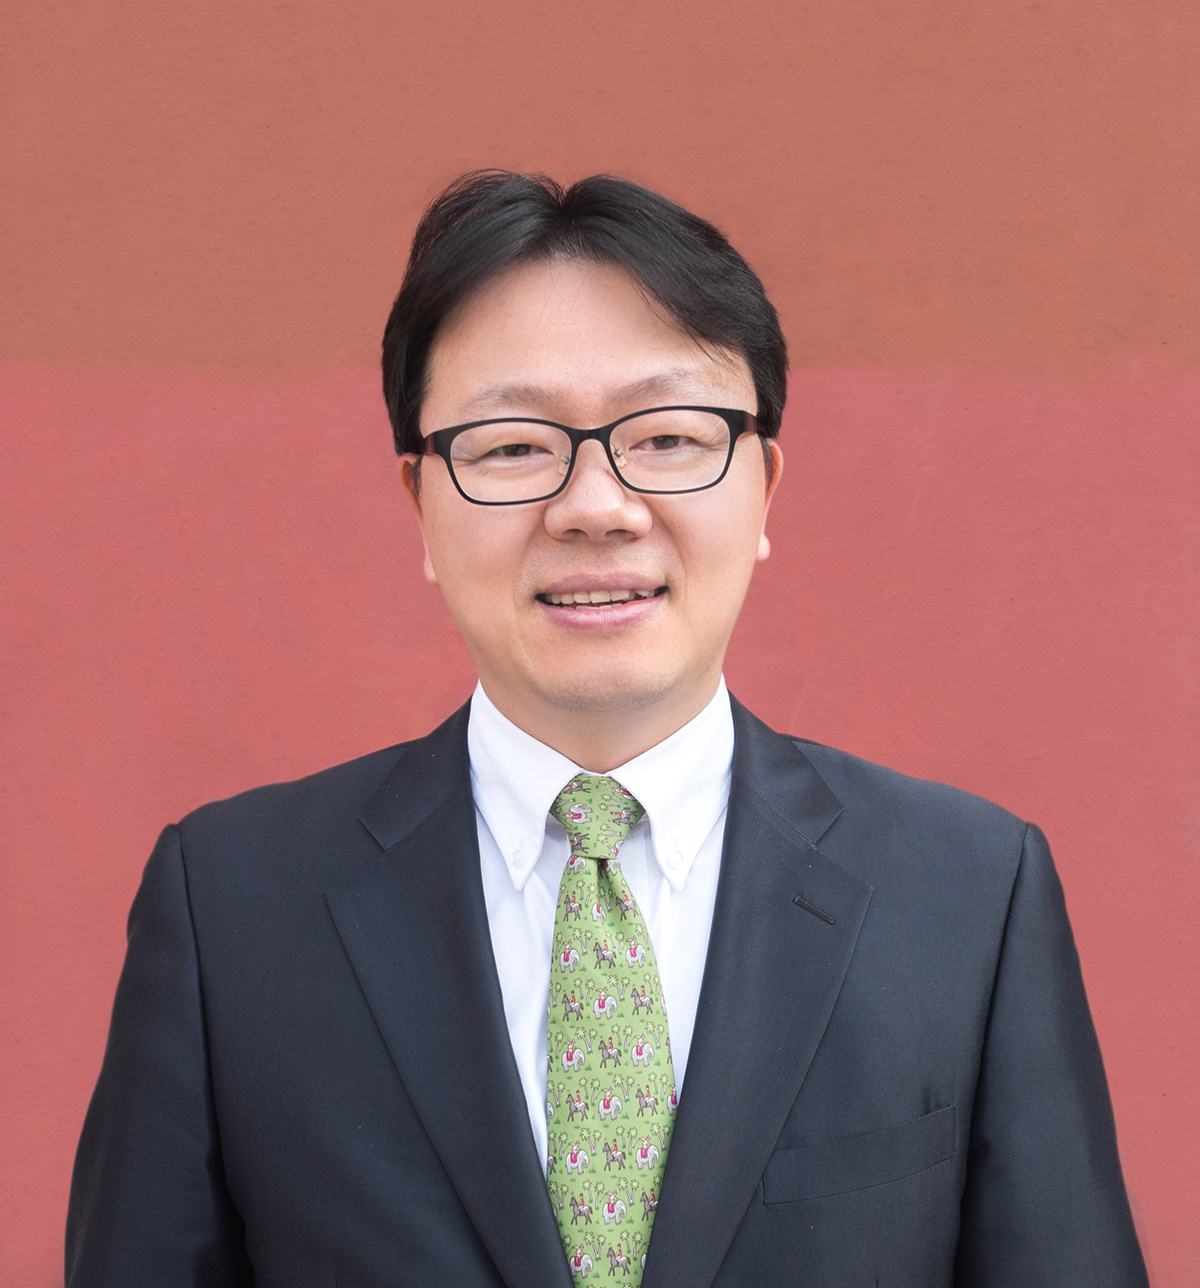 Rev. Inhyun Ryu  Senior Pastor 267-241-8638 inhyun.ryu@nfcnyc.org facebook.com/hyun191